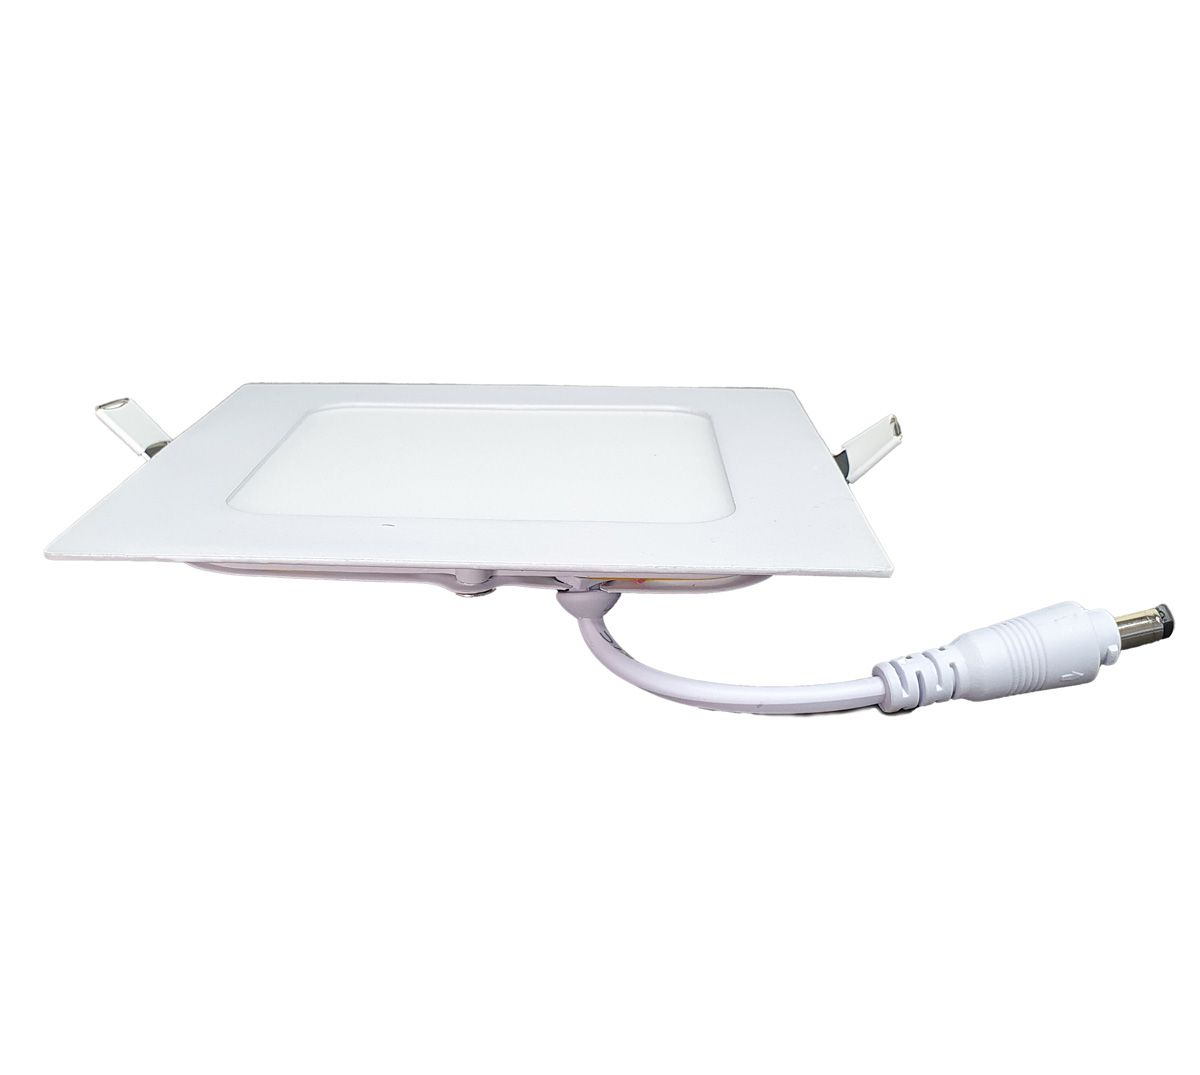 KIT 6 Painel Plafon LED 6w Quadrado Embutir Branco Frio Luminária